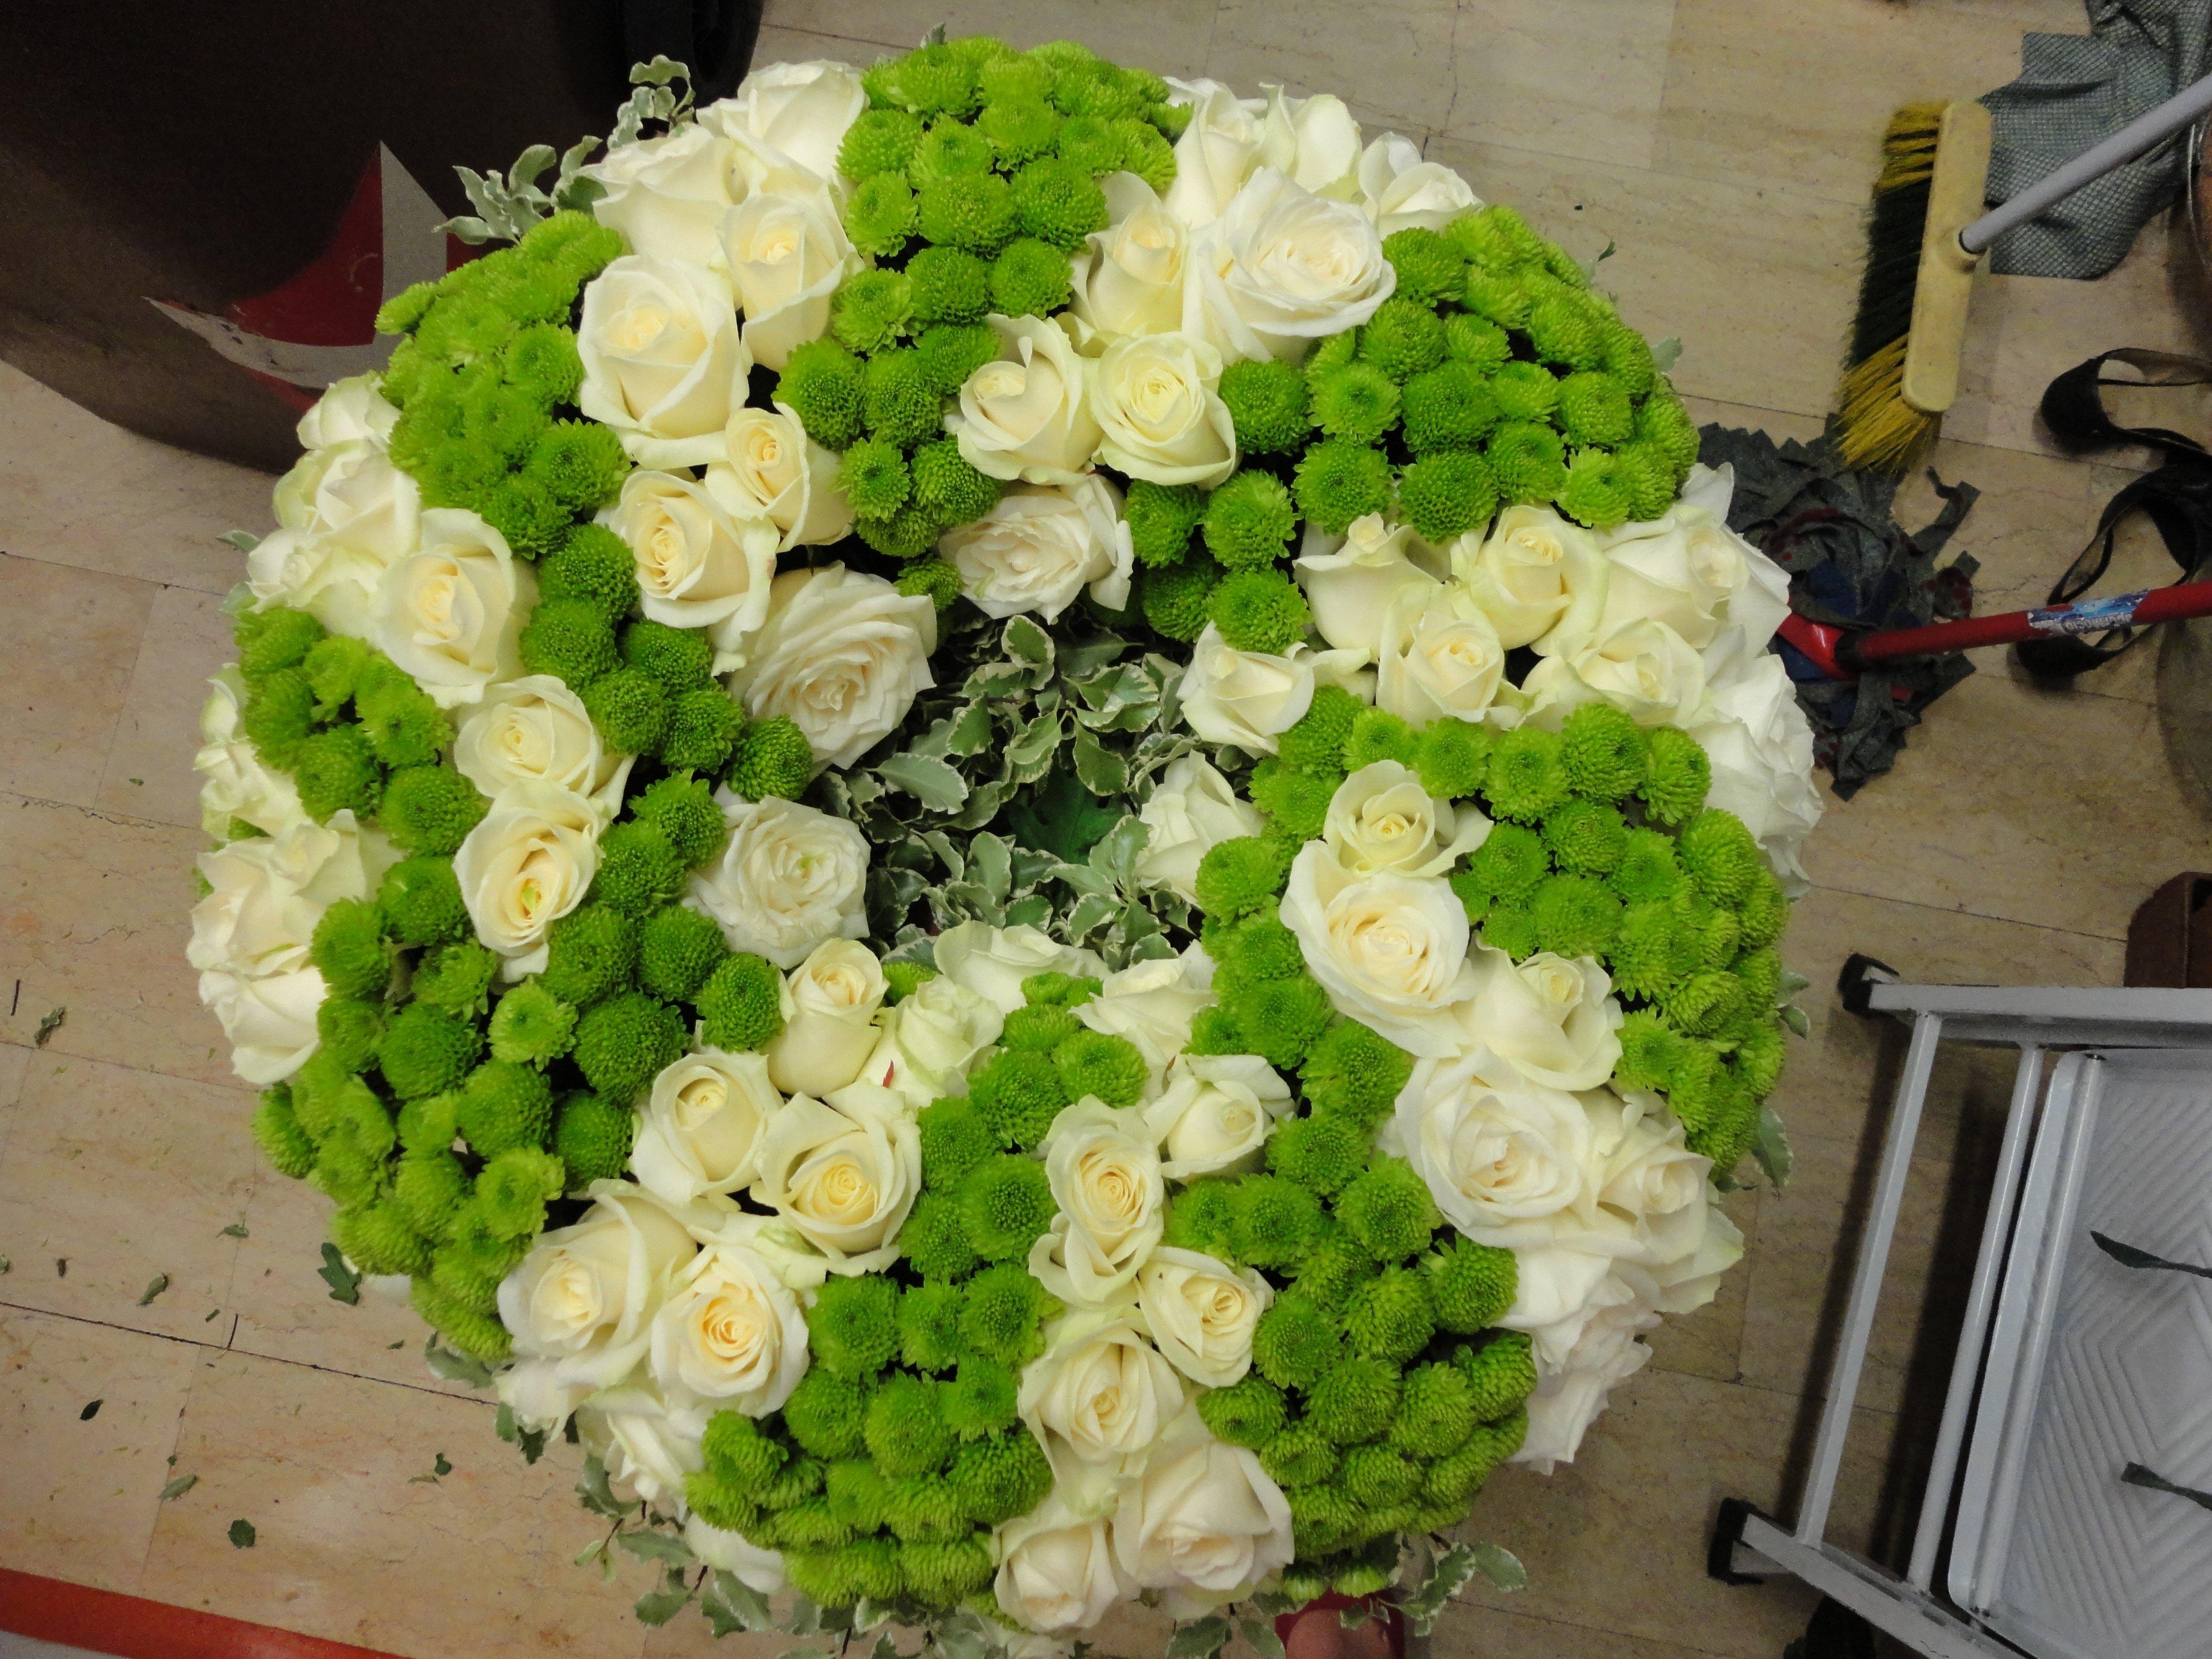 corona di fiori bianchi e verdi